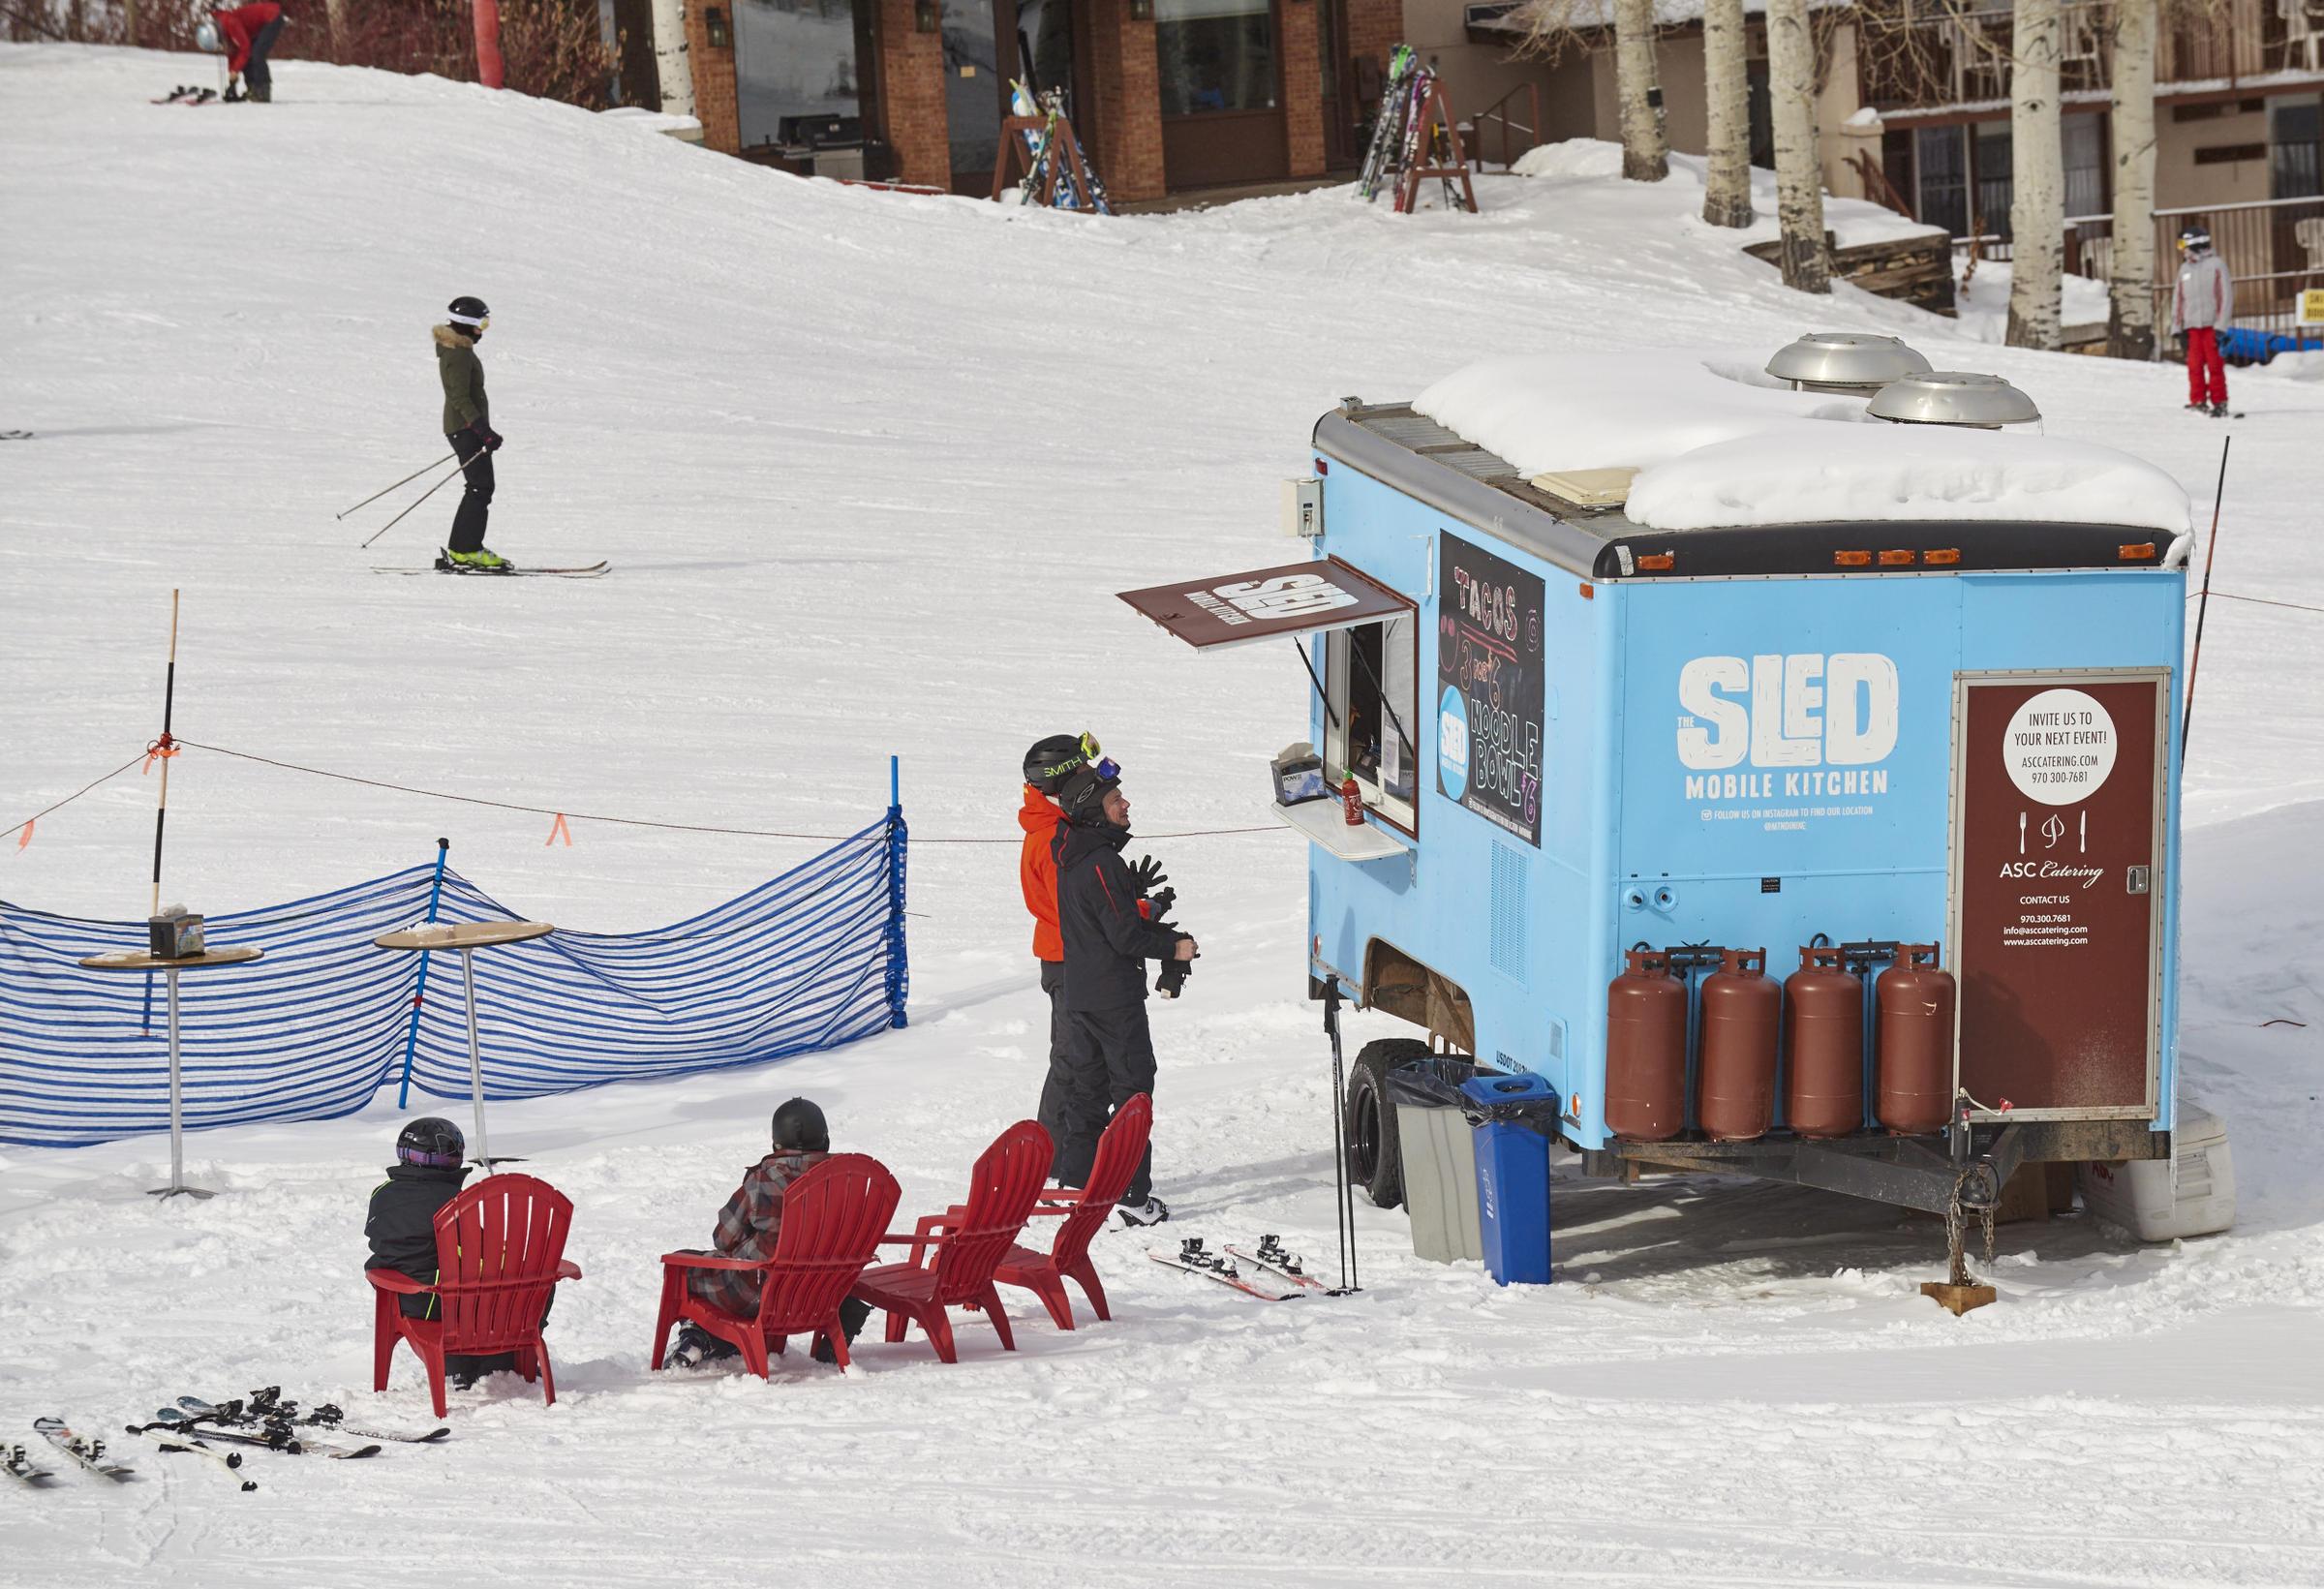 Mobile mountain food truck hits the slopes | Aspen Public Radio